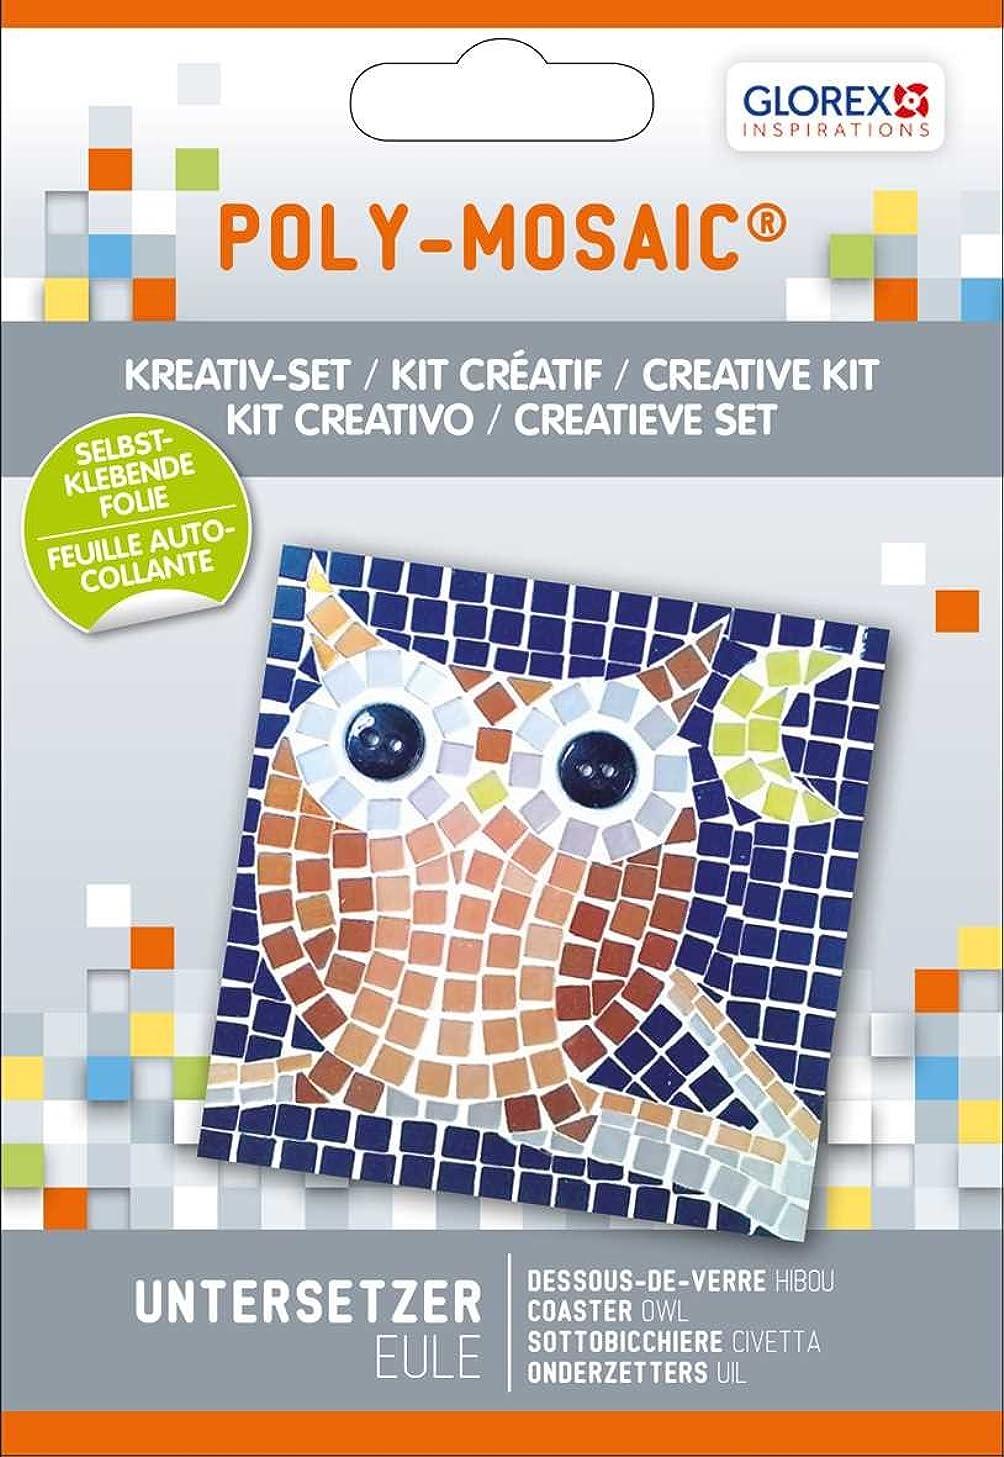 Glorex Poly Owl Mosaic Creative Set Plastic Multi Colour 17?x 11.6?x 1.5?cm